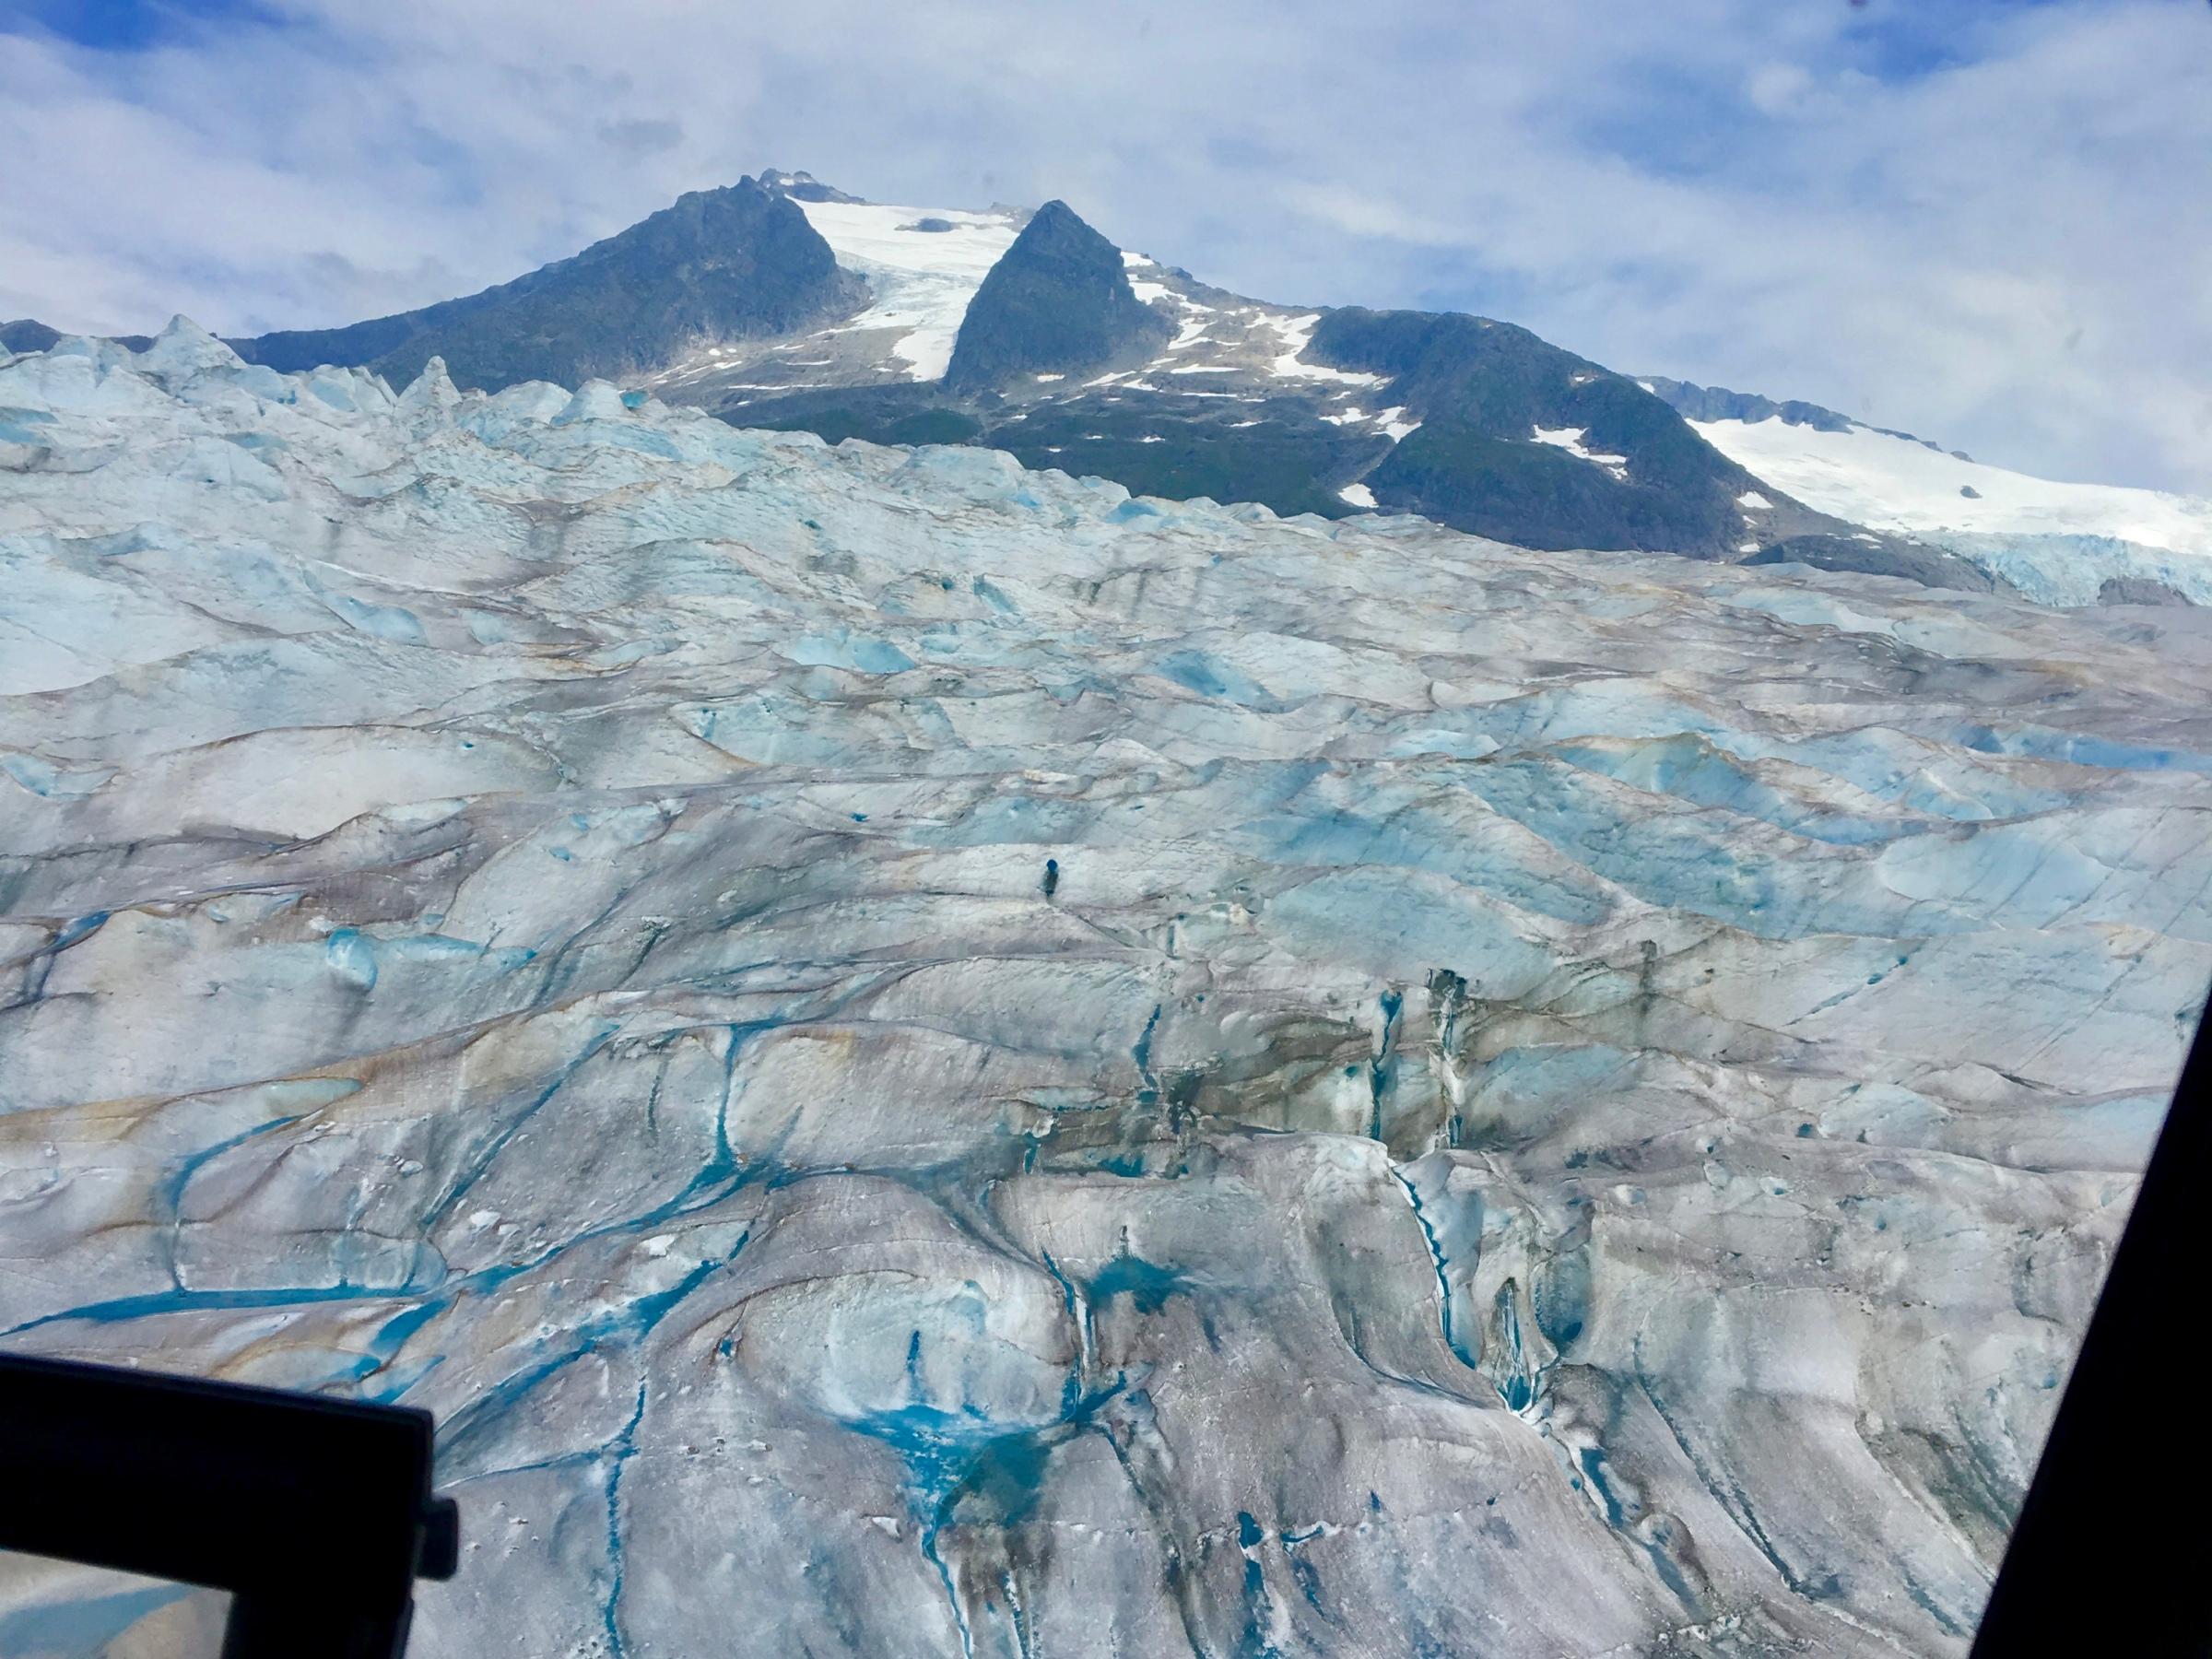 image of Mendenhall Glacier in Alaska